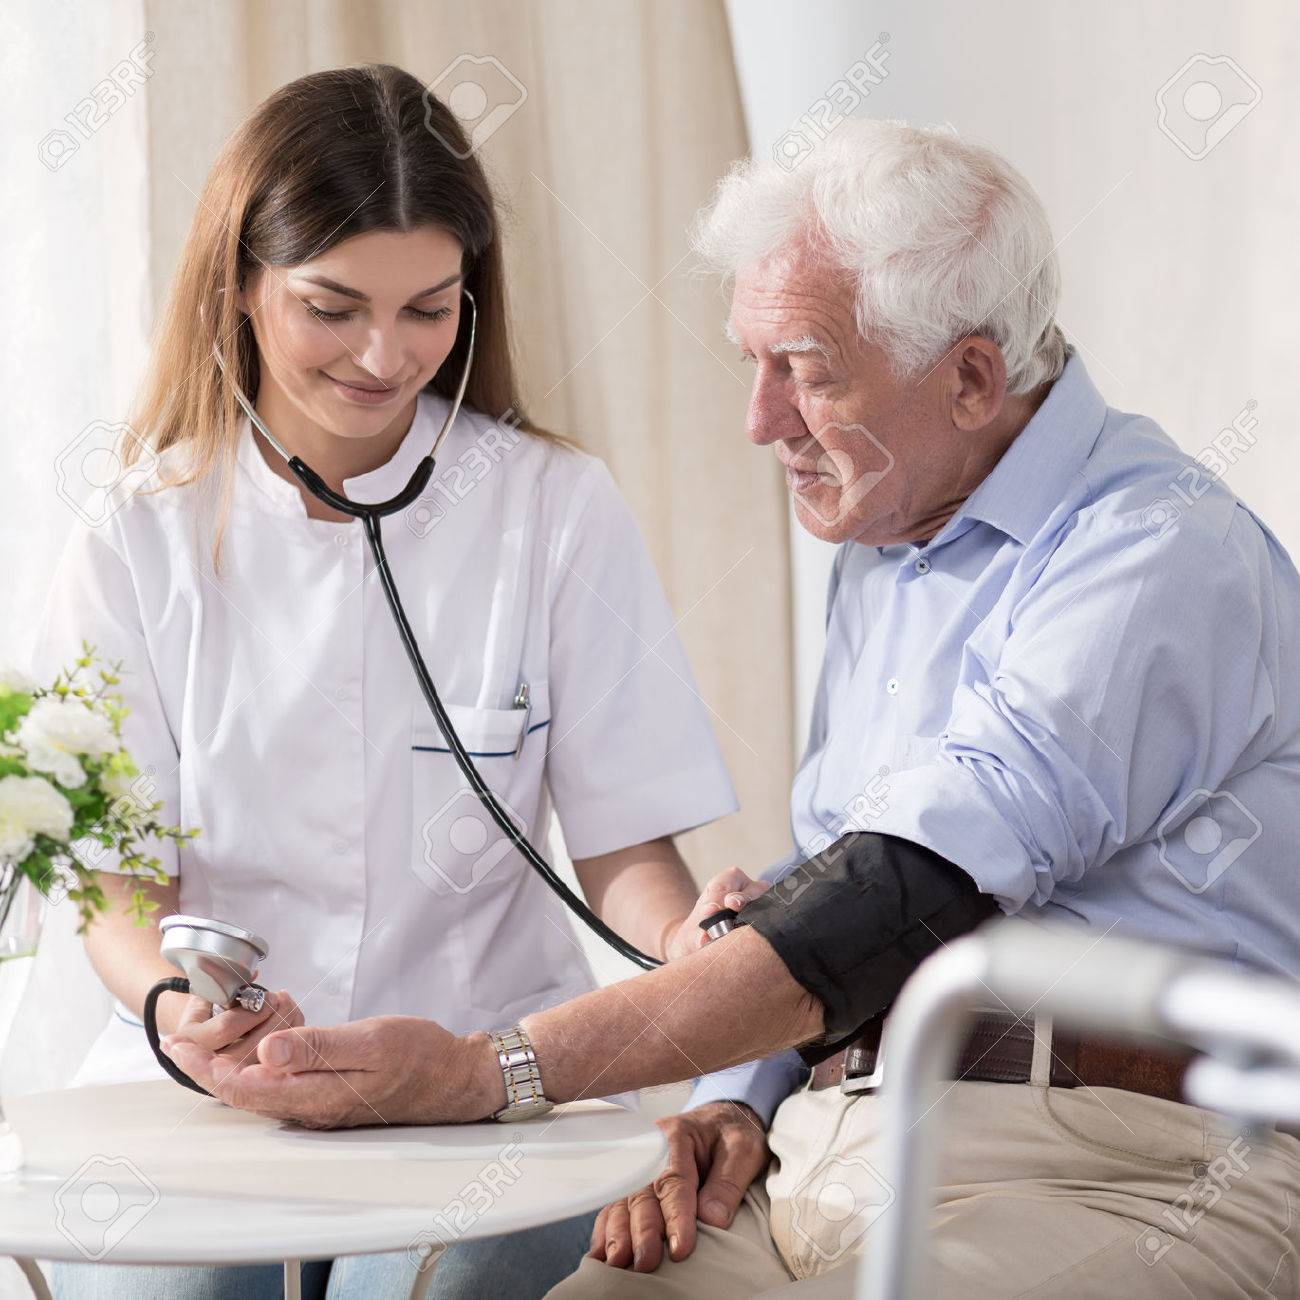 Young nurse is taking elder man's blood - 52250827